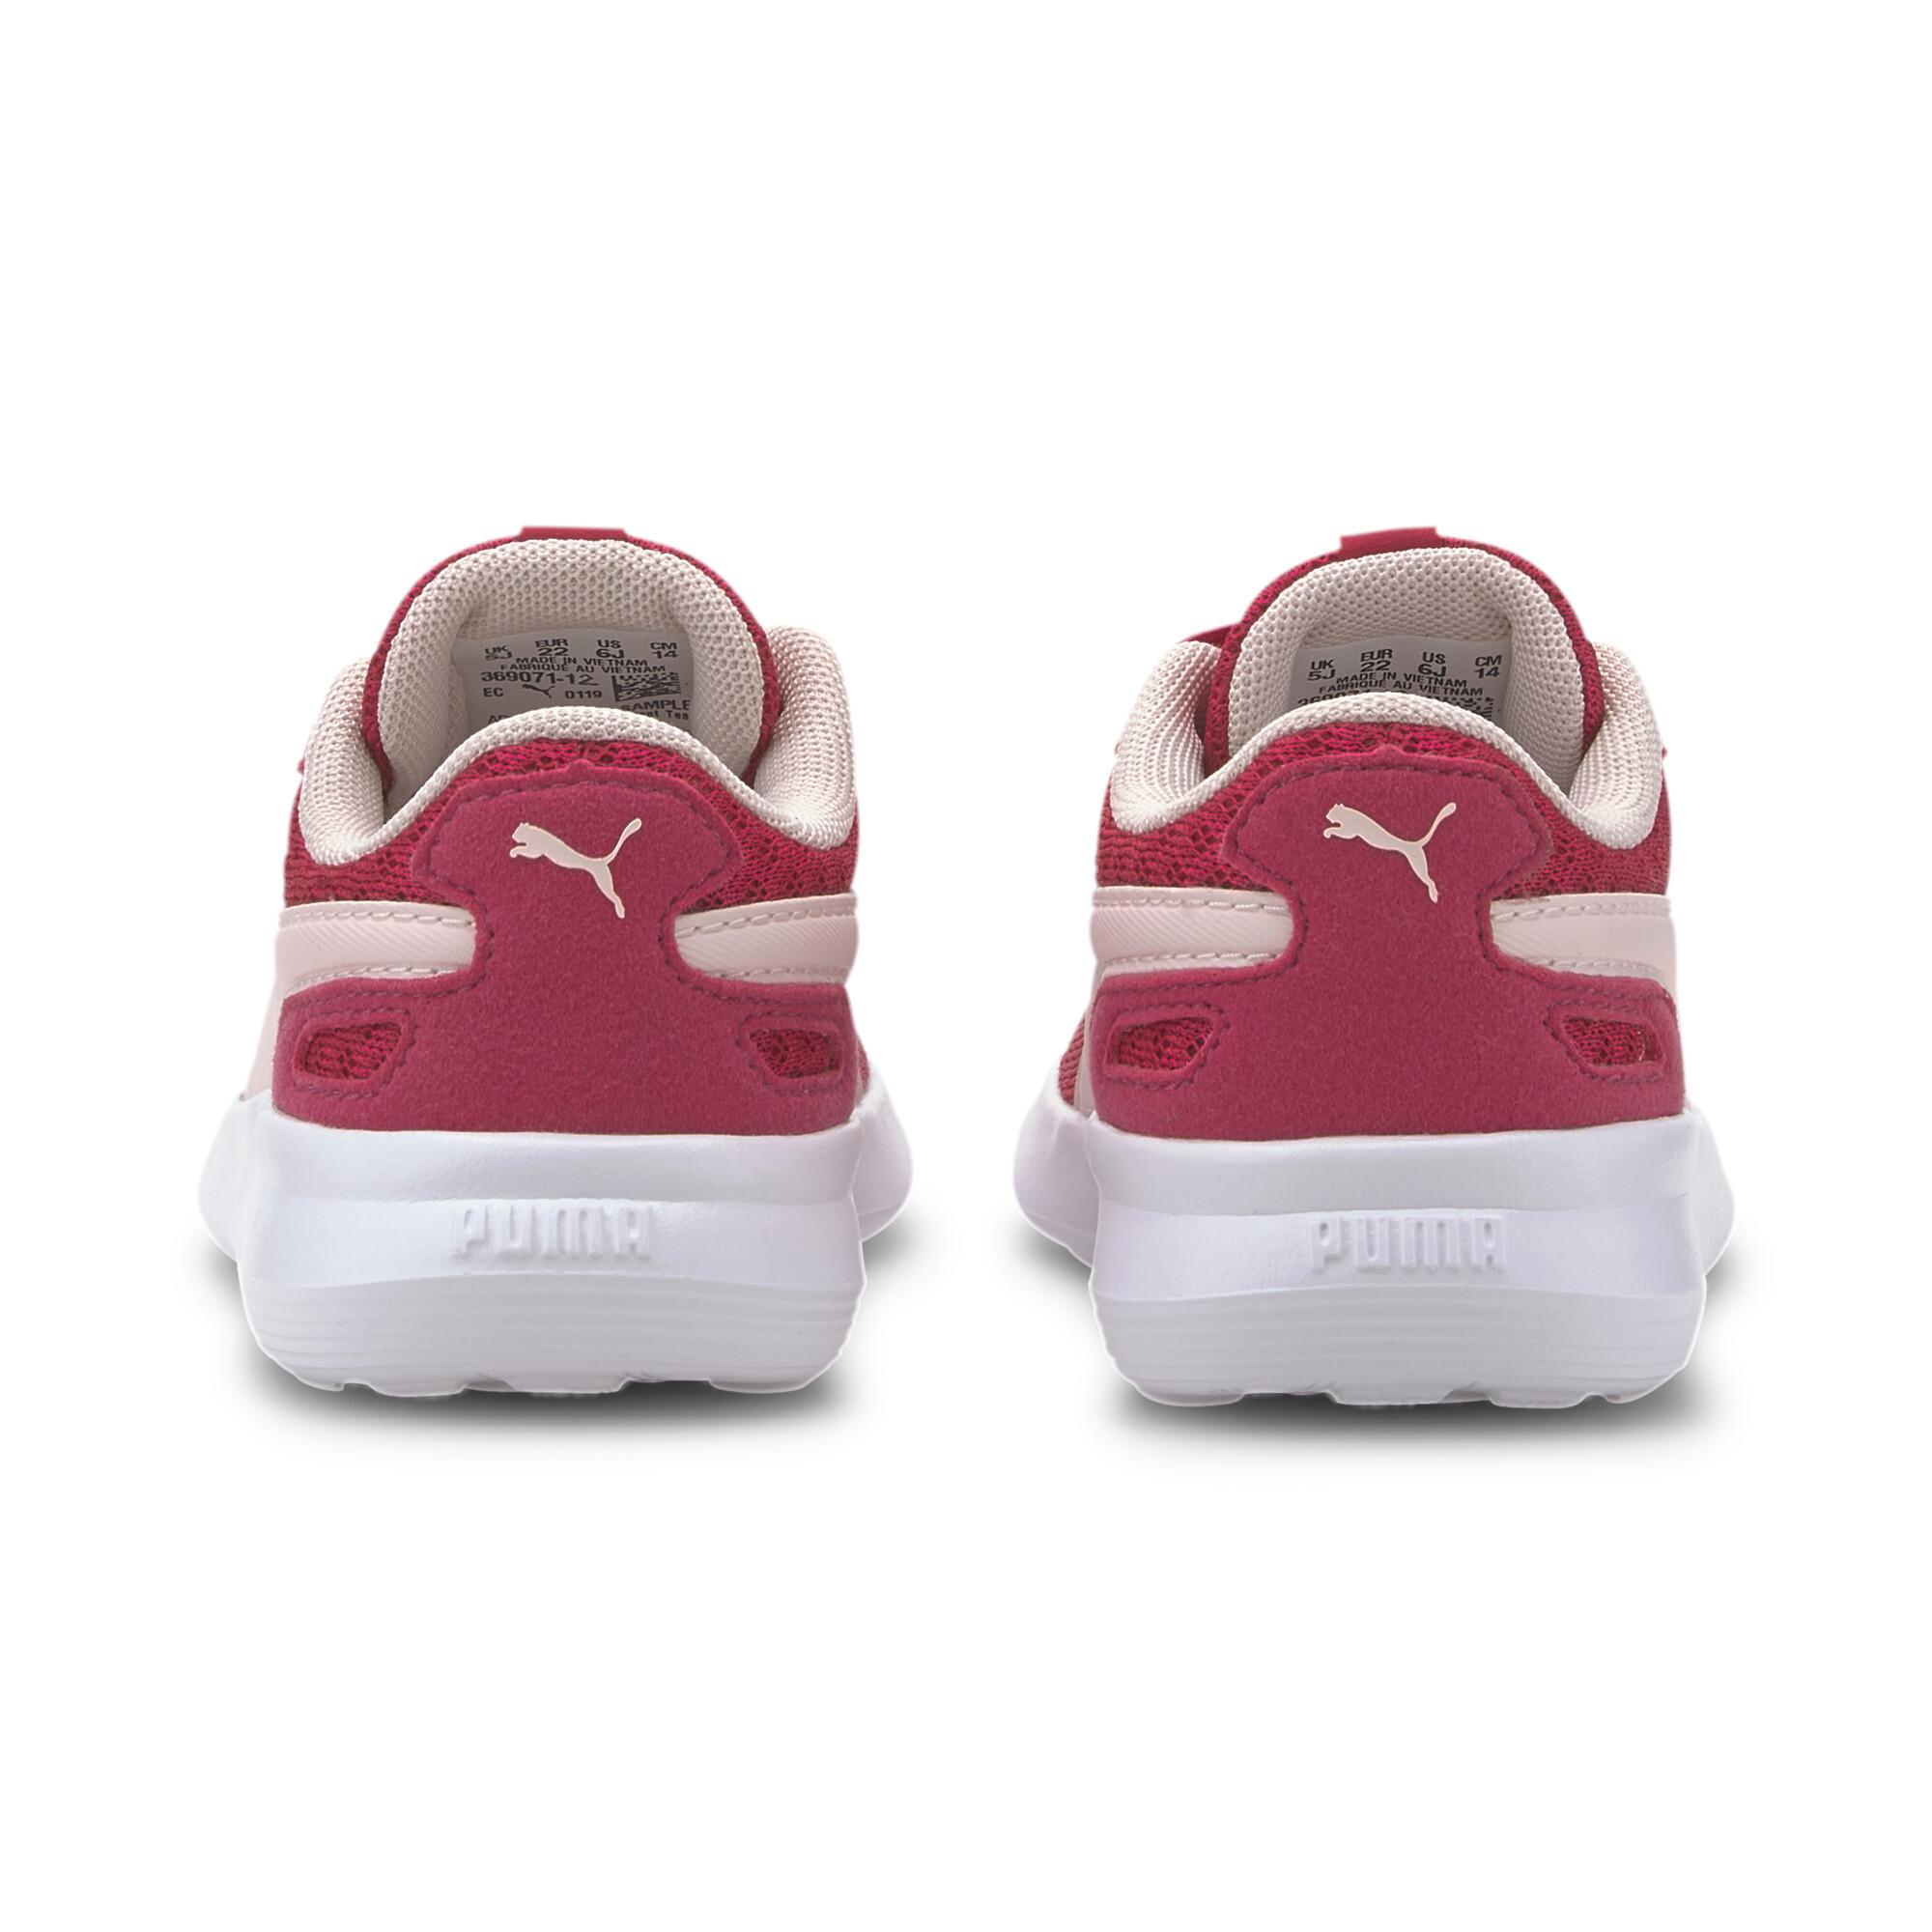 PUMA-ST-Activate-AC-Toddler-Shoes-Kids-Shoe-Kids thumbnail 3